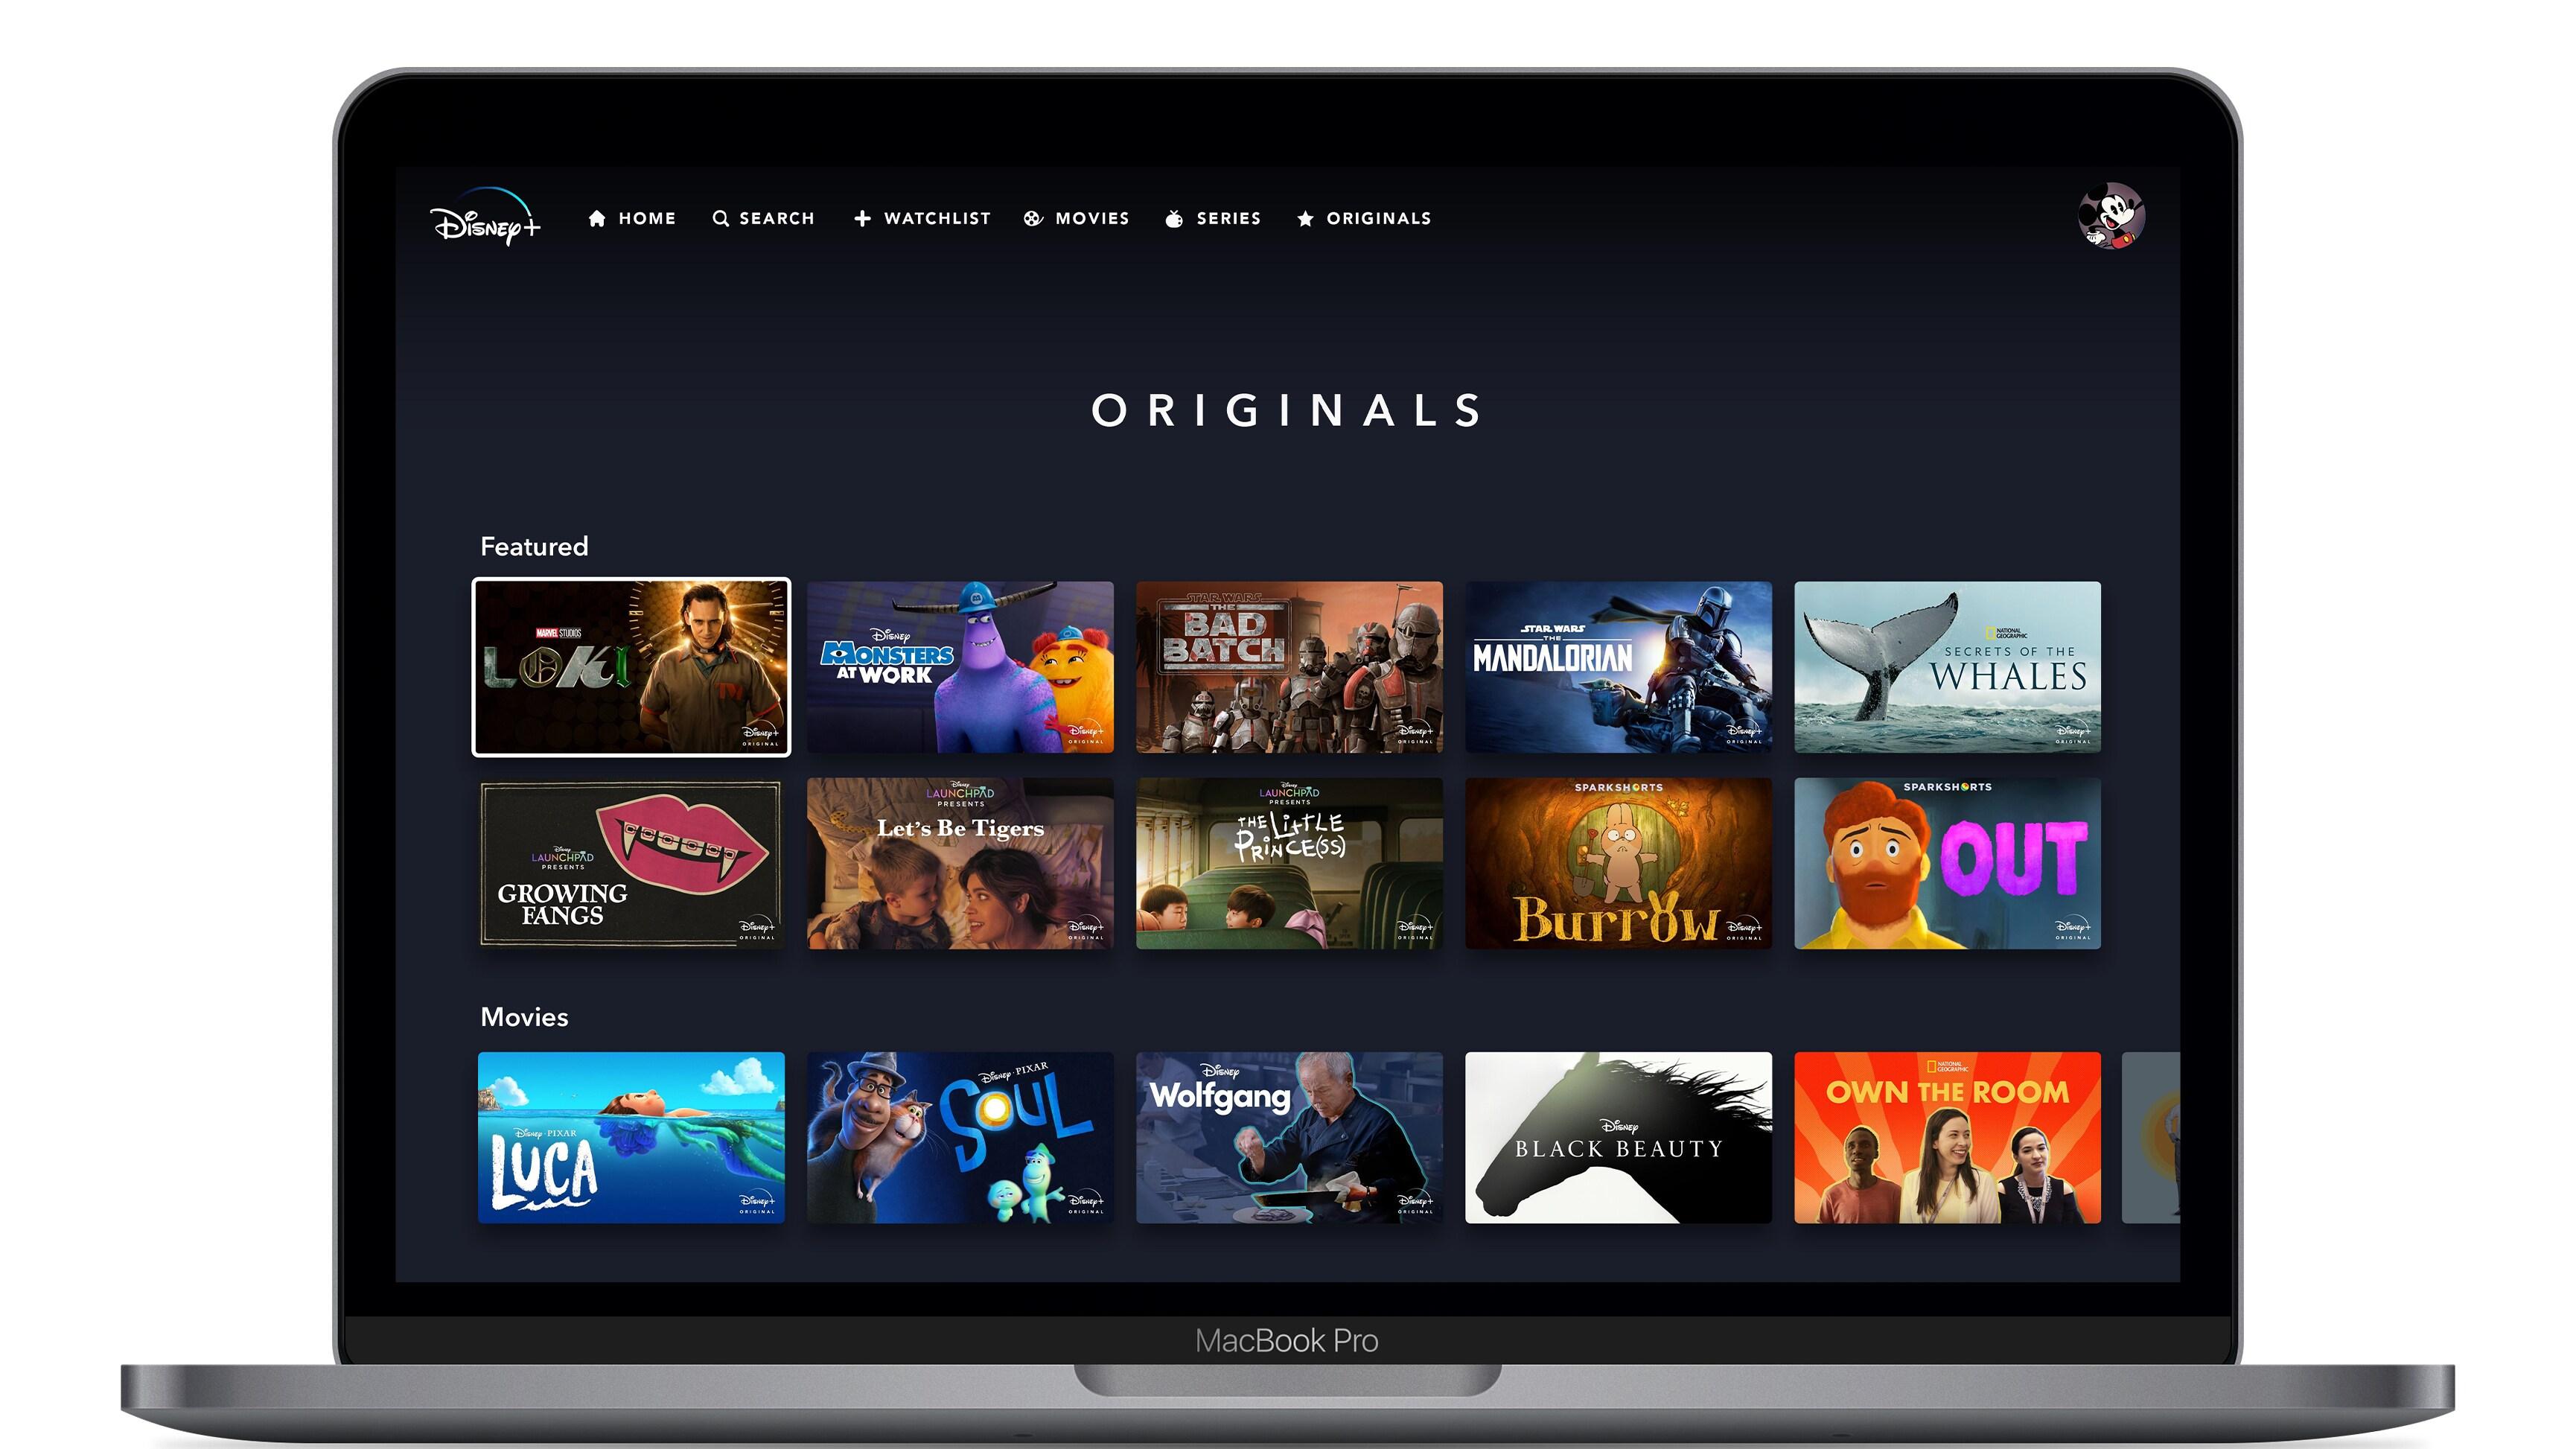 Disney+ Originals Page on Web Device